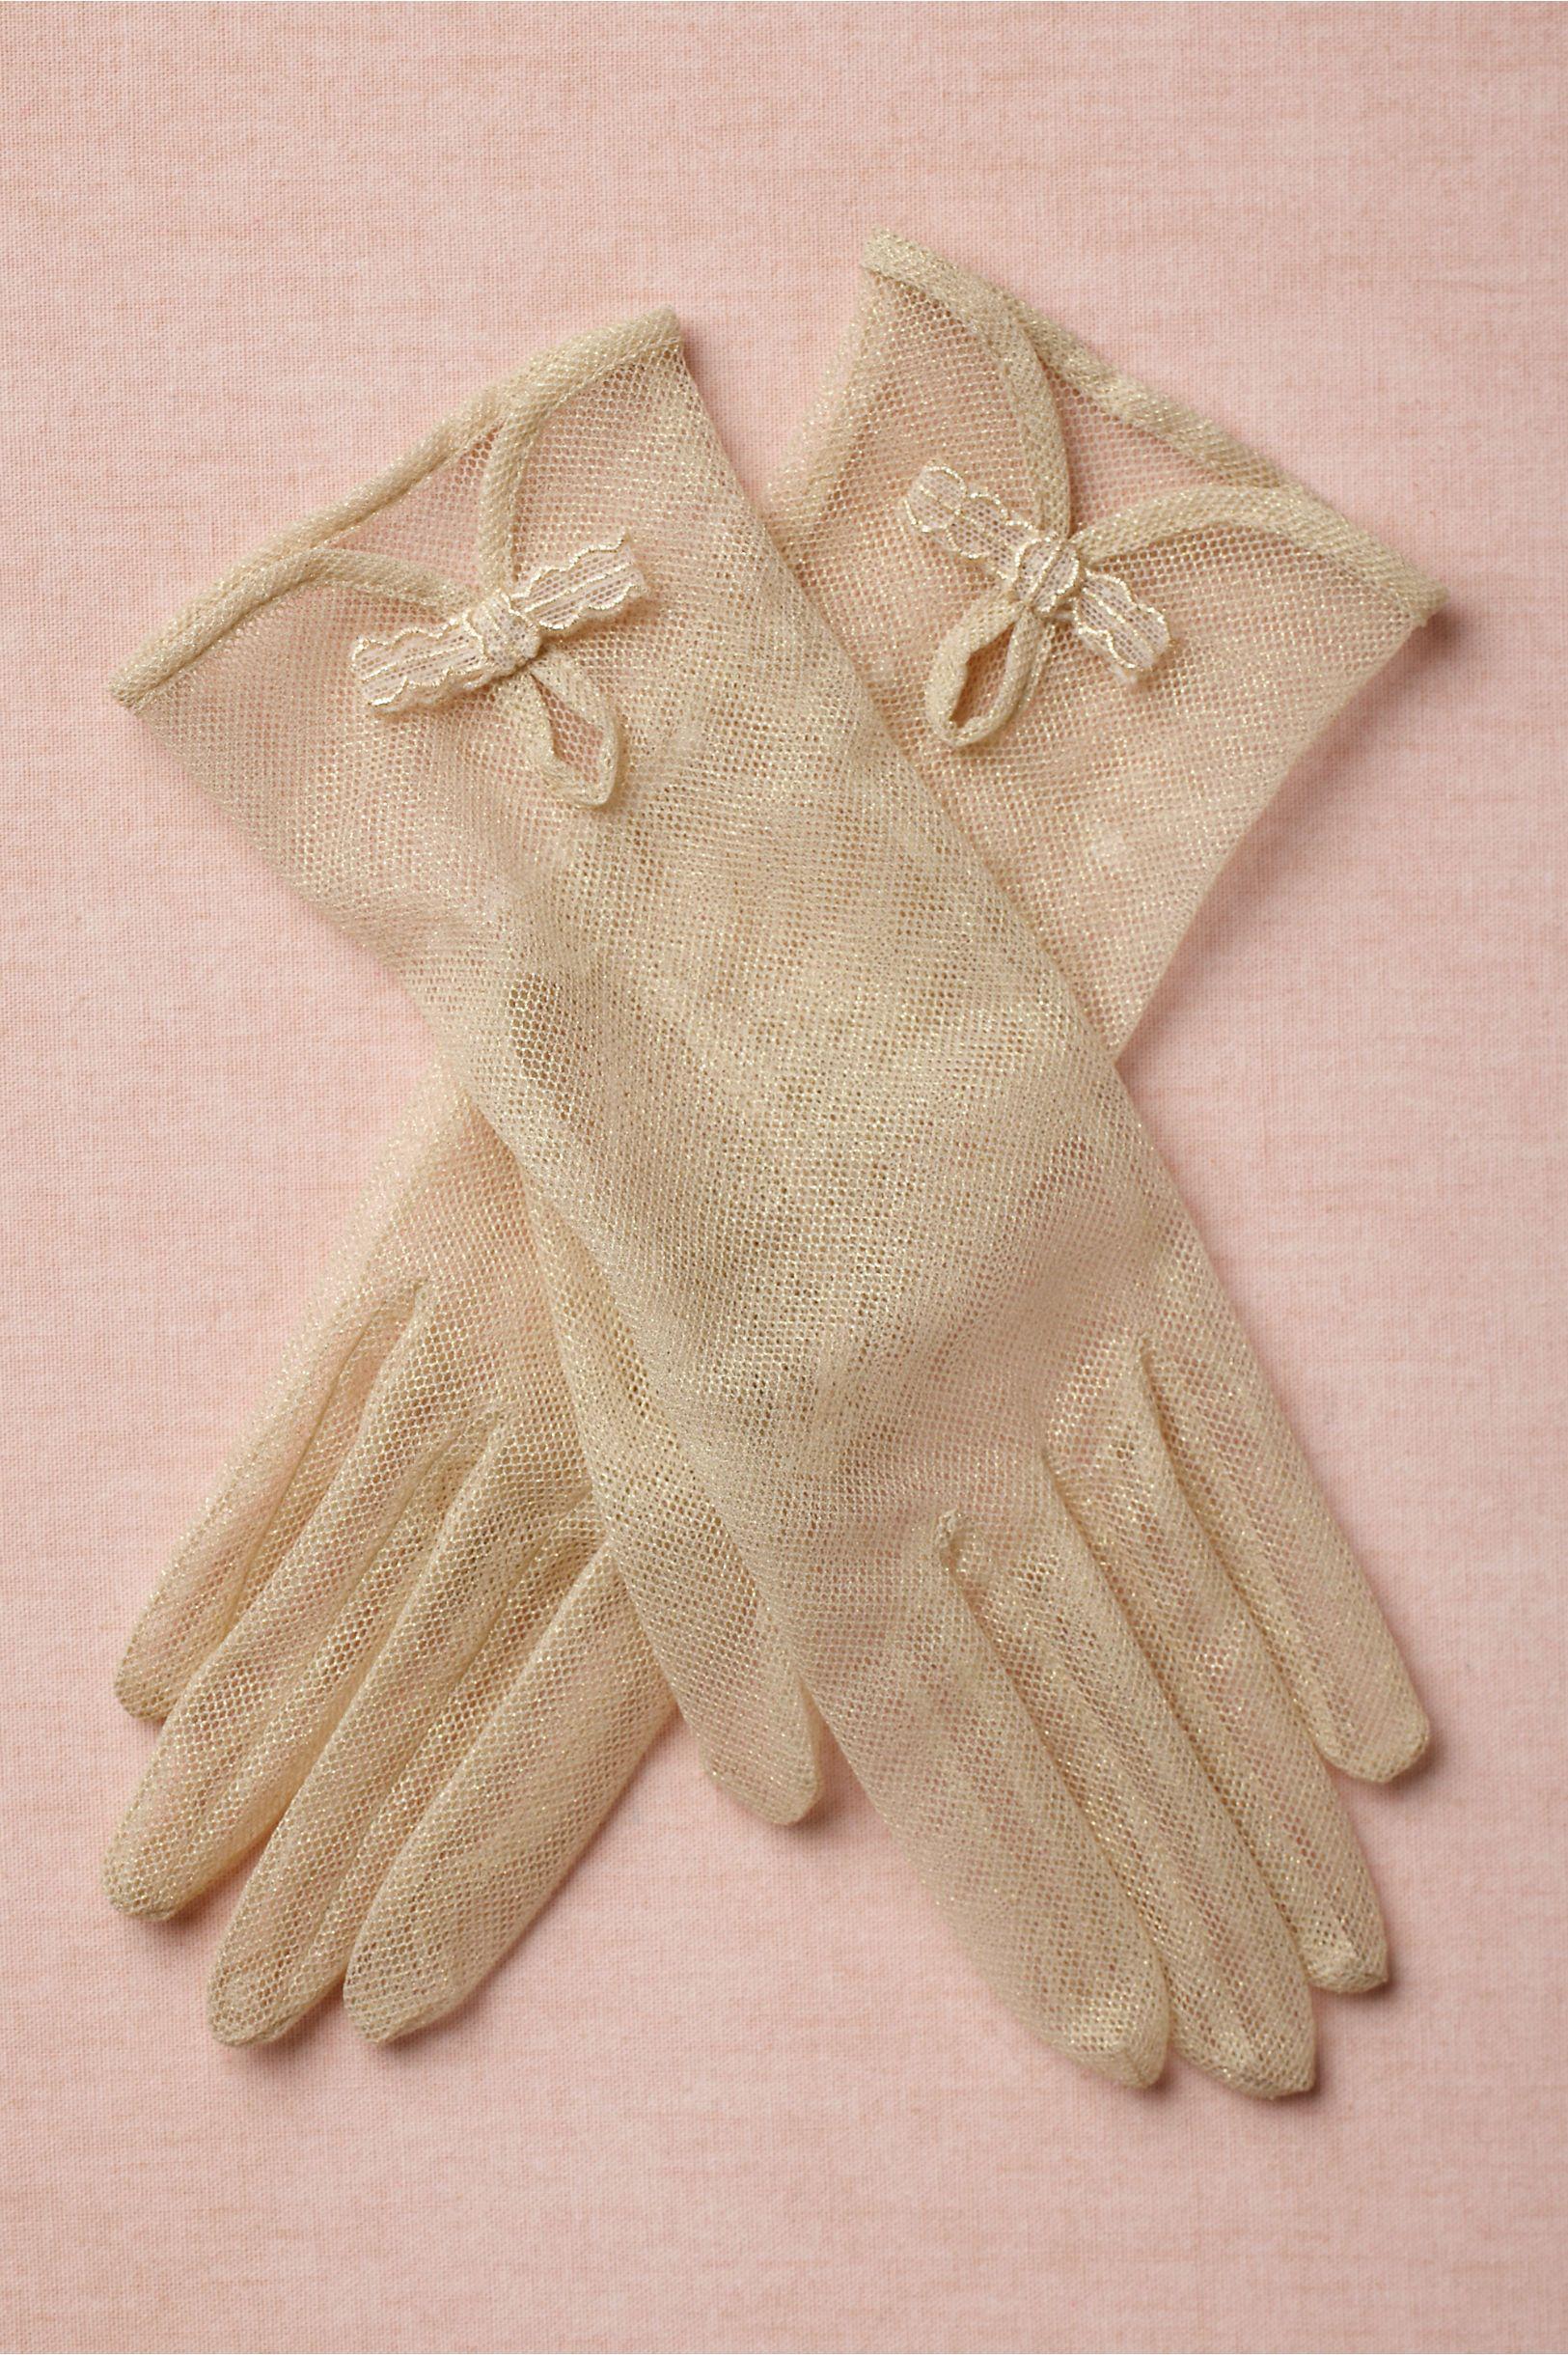 Evening-Gloves-0940